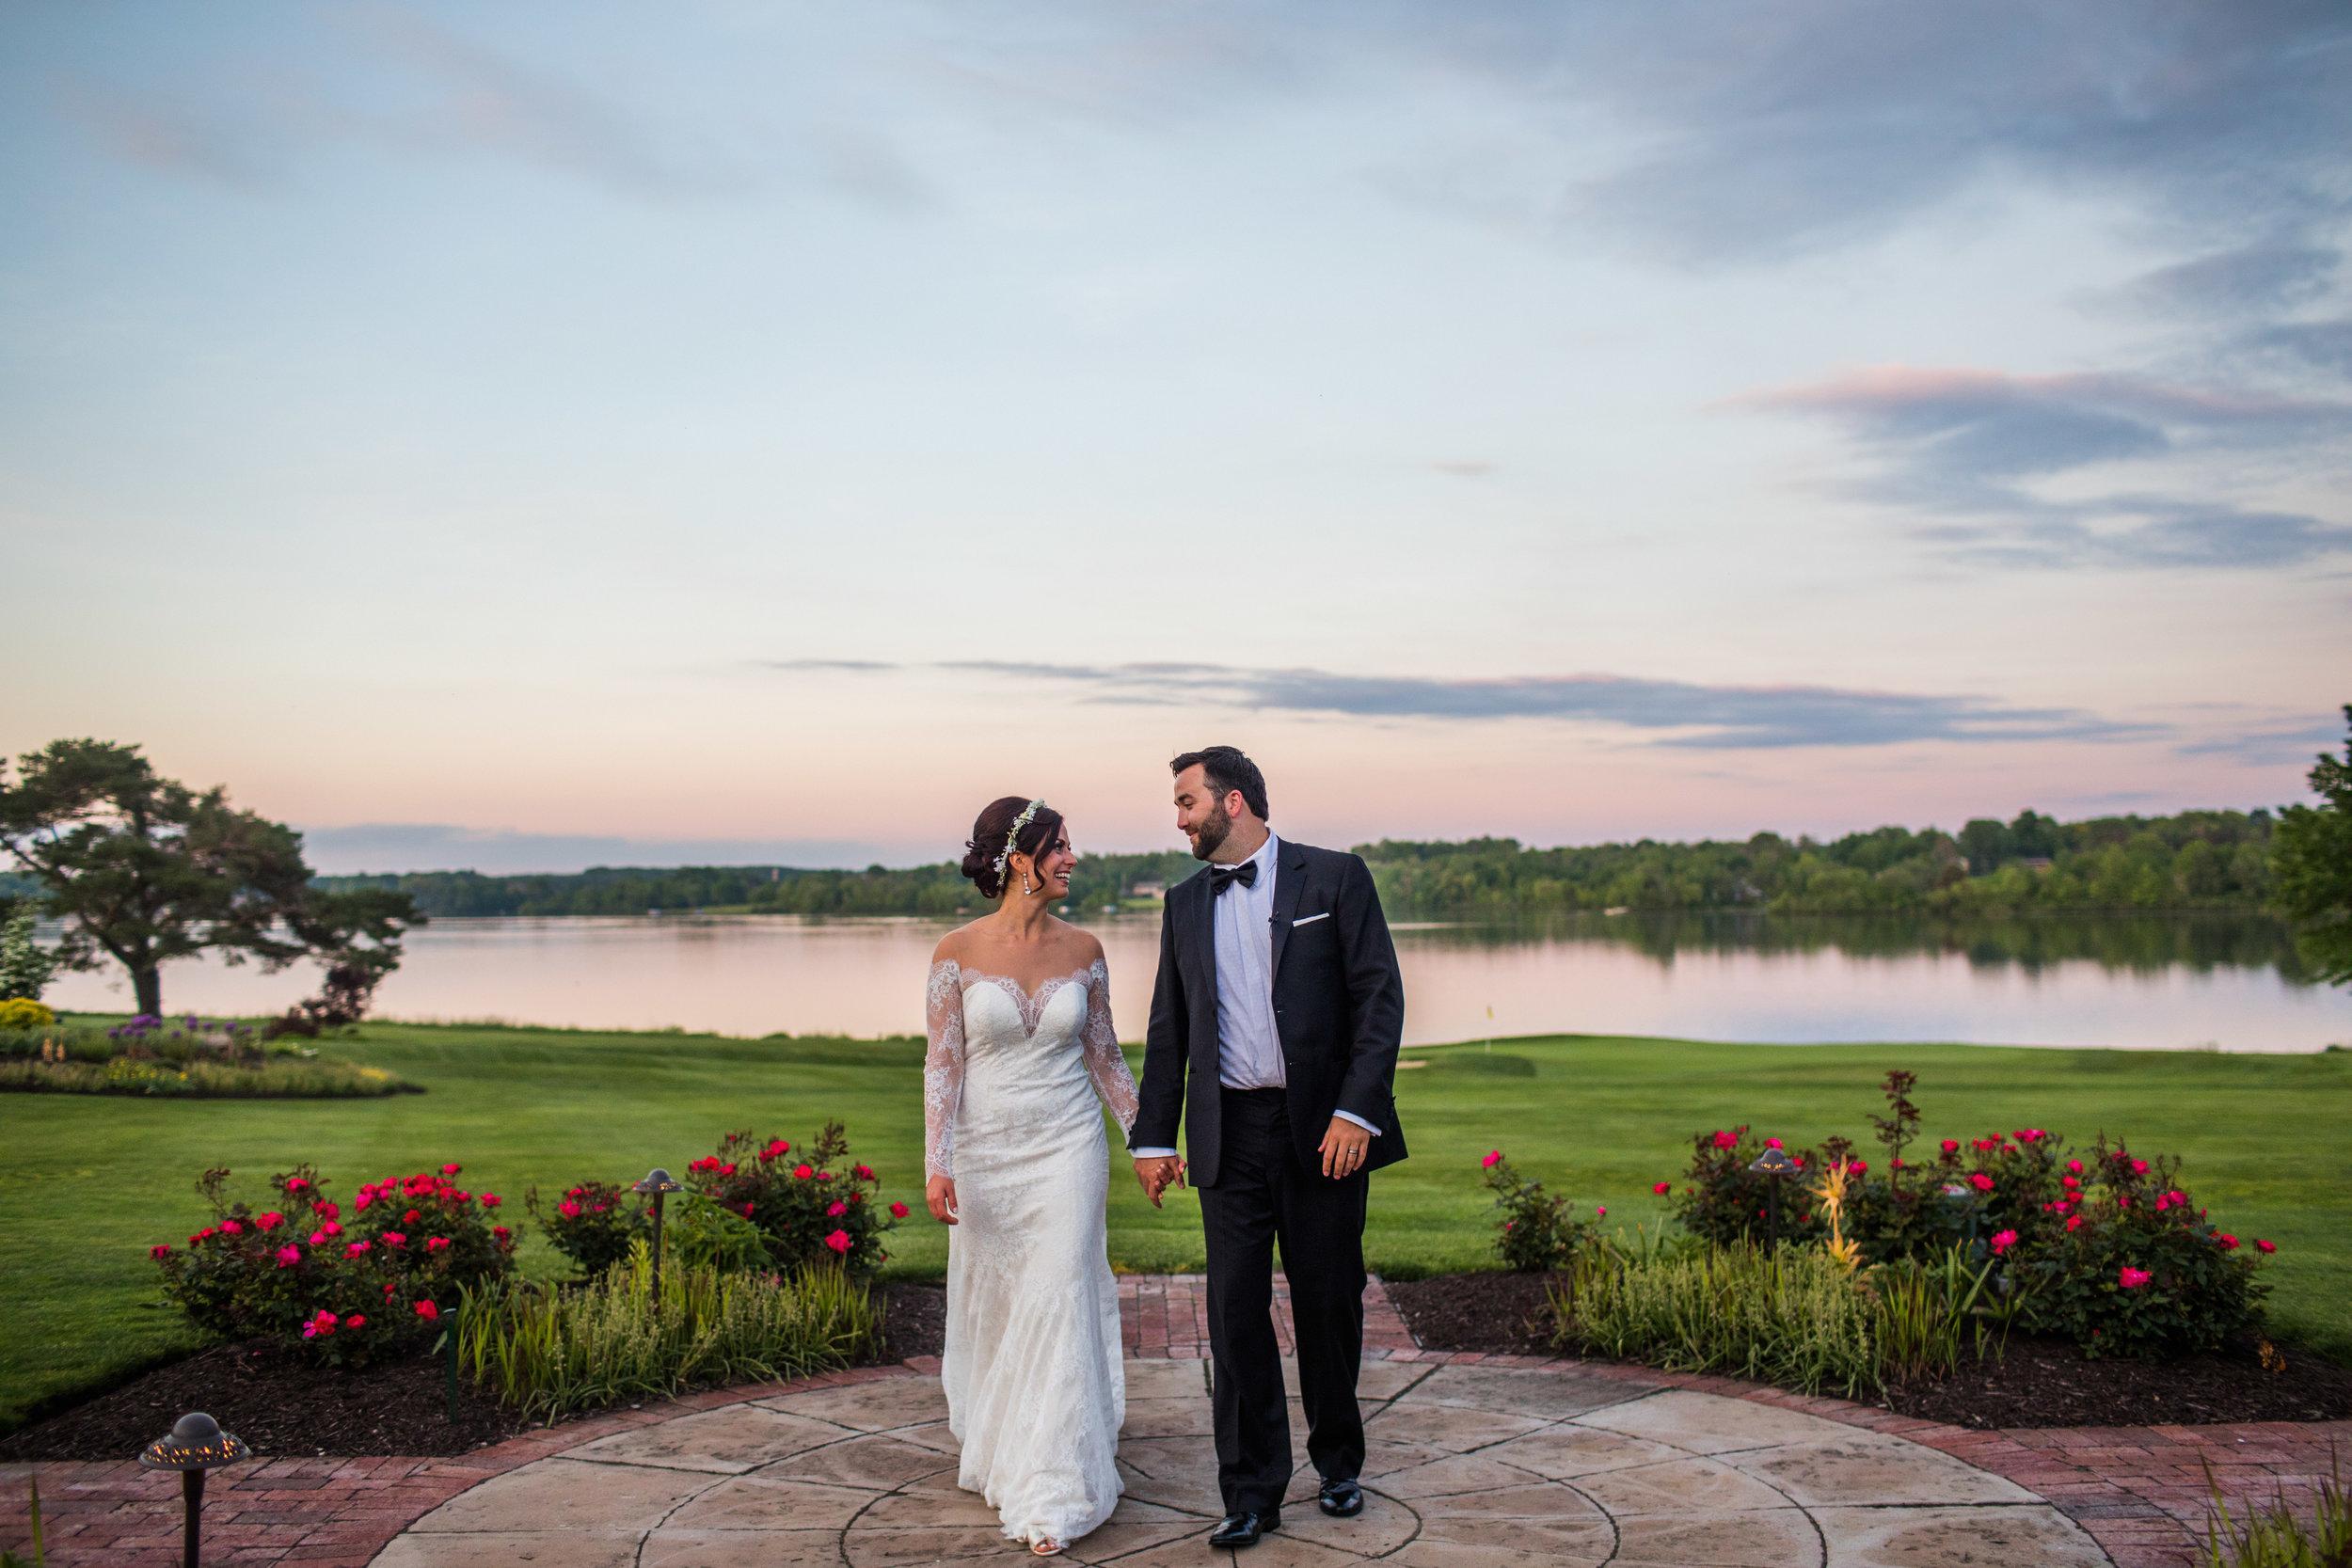 Poland Presbyterian Church and The Lake Club of Ohio Wedding_Lindsey Ramdin_LAR Weddings